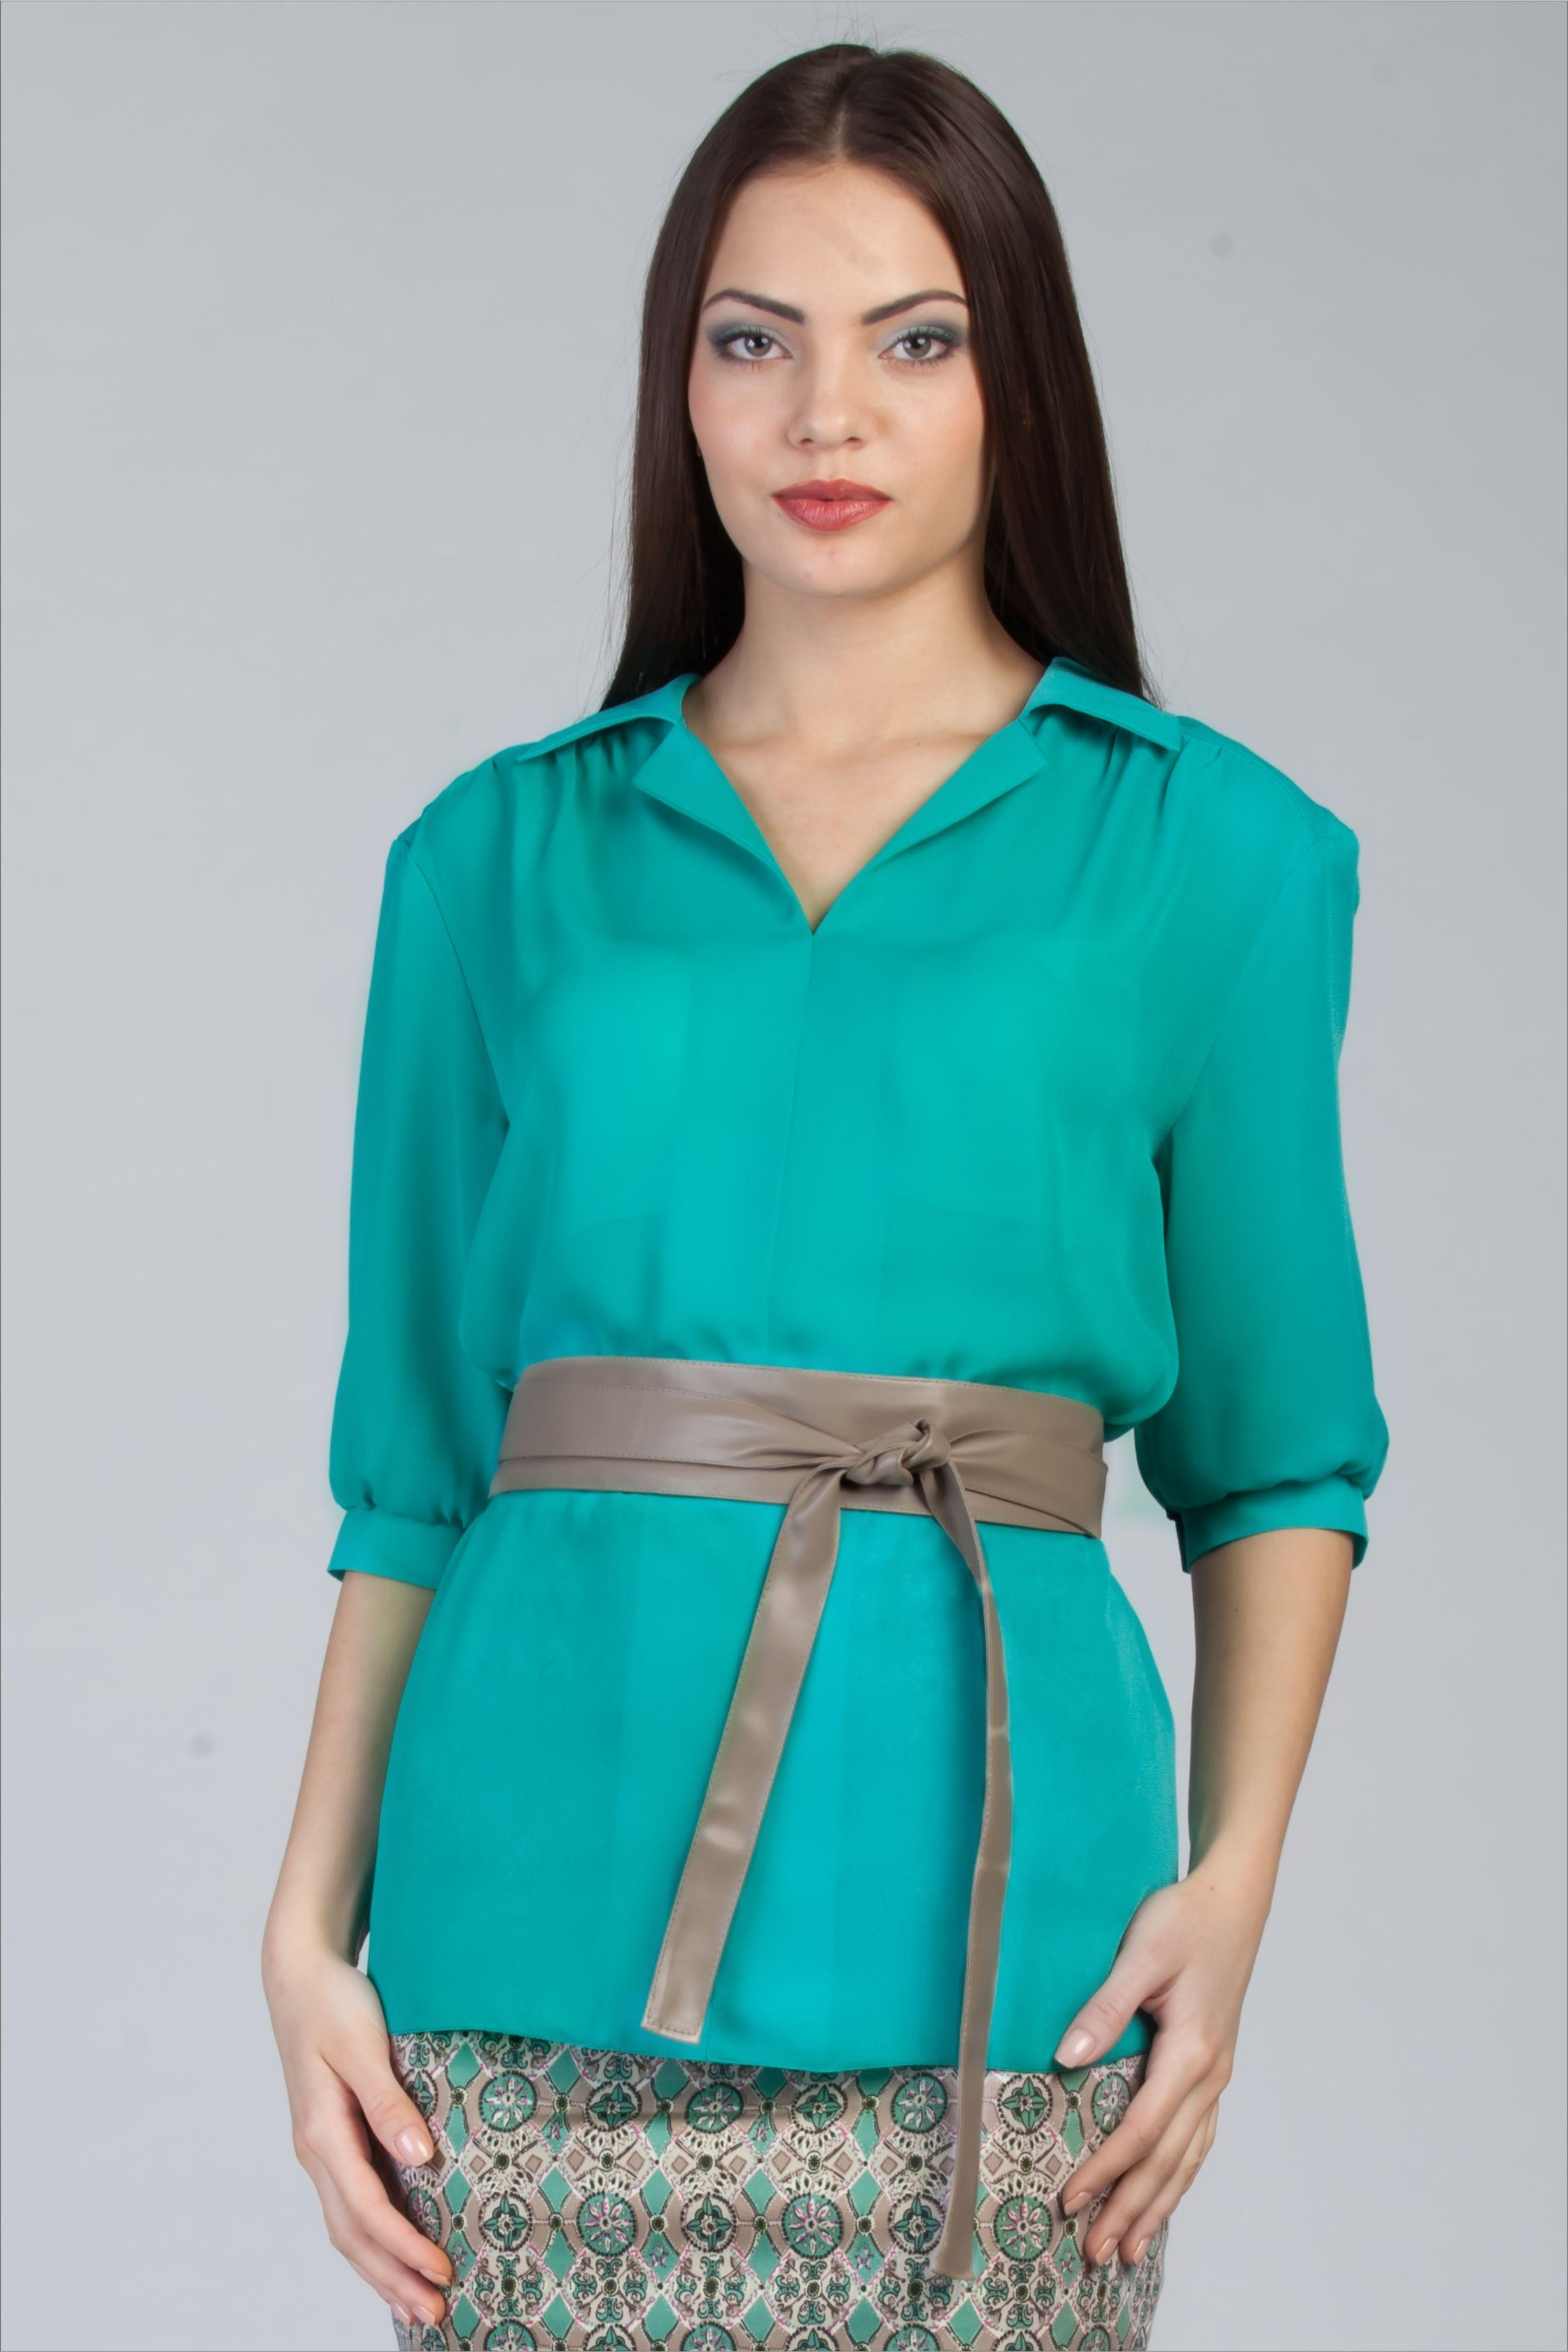 Блузки Яркие С Доставкой